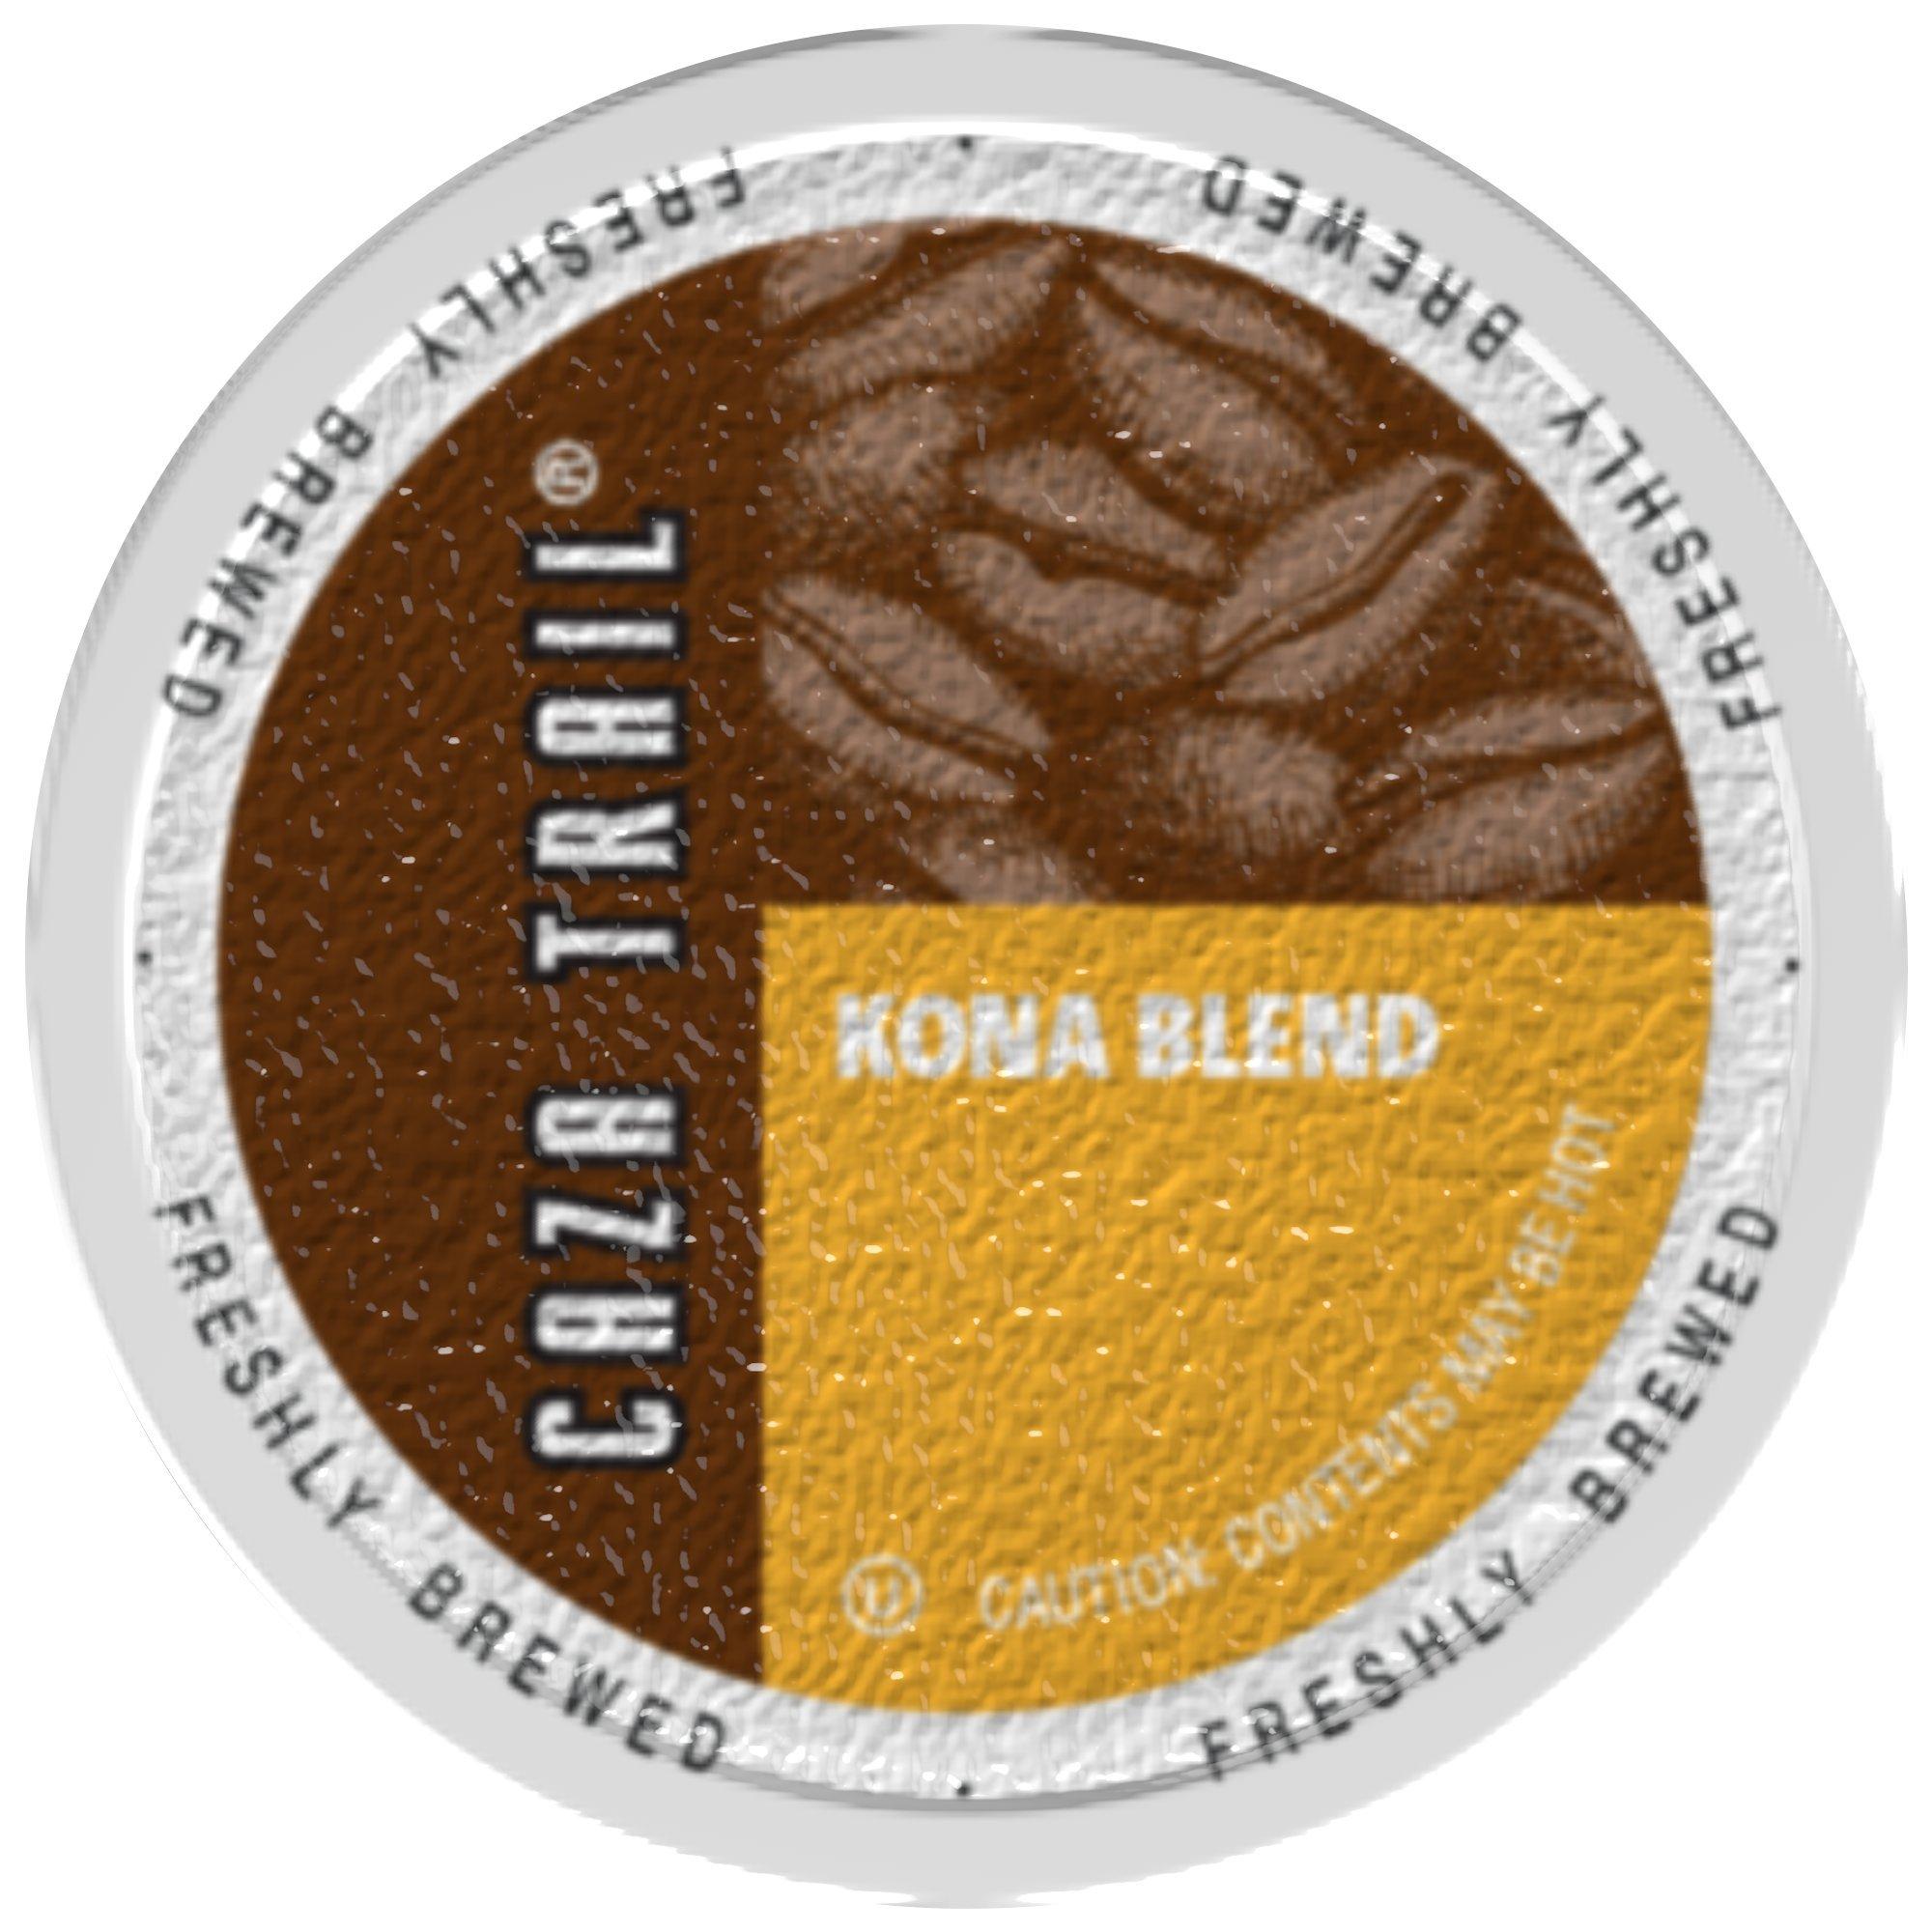 Caza Trail Coffee, Kona Blend, 100 Single Serve Cups by Caza Trail (Image #3)